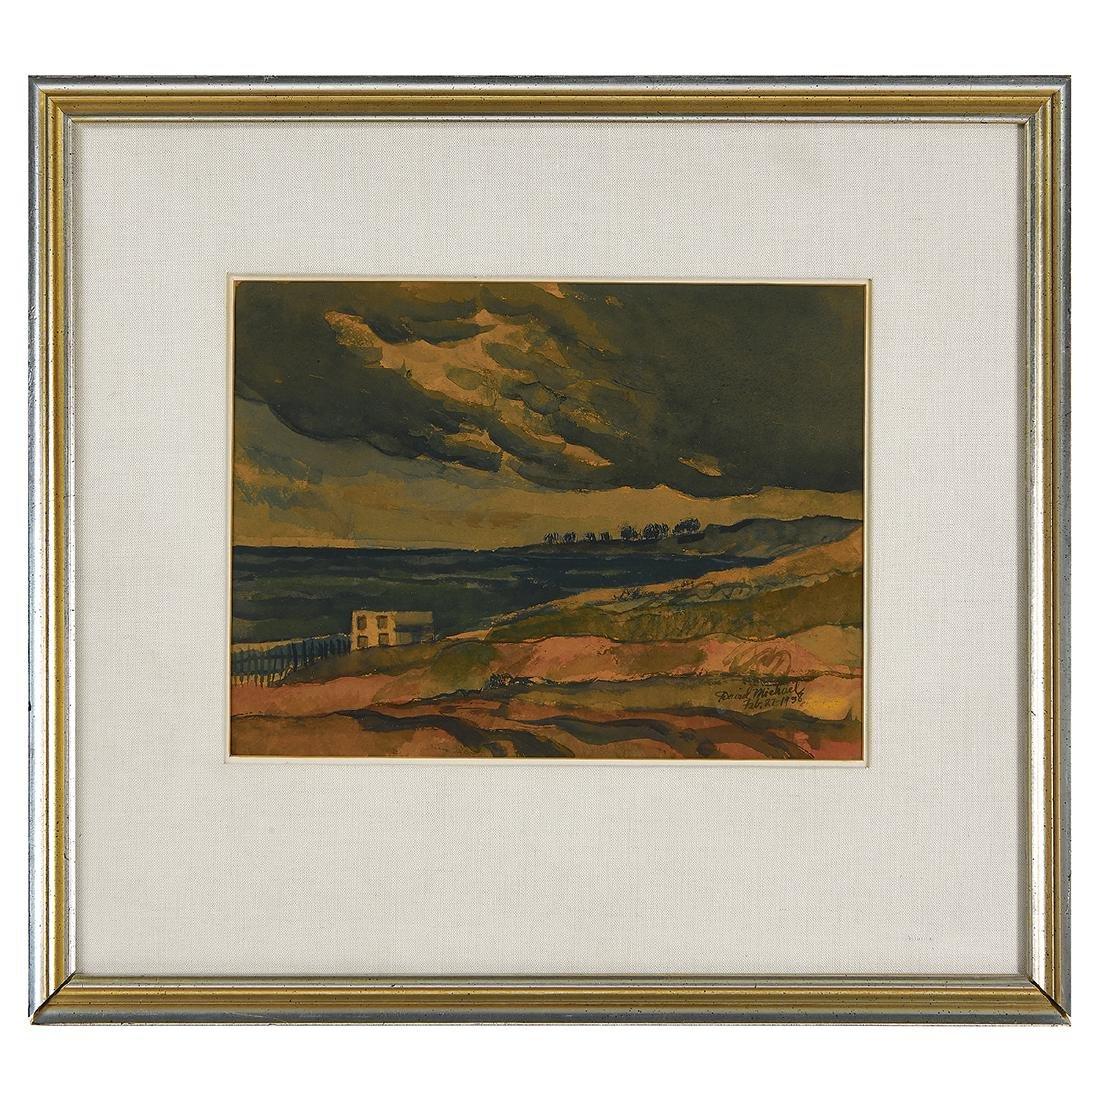 David Michael, Landscape, 1938 - 2